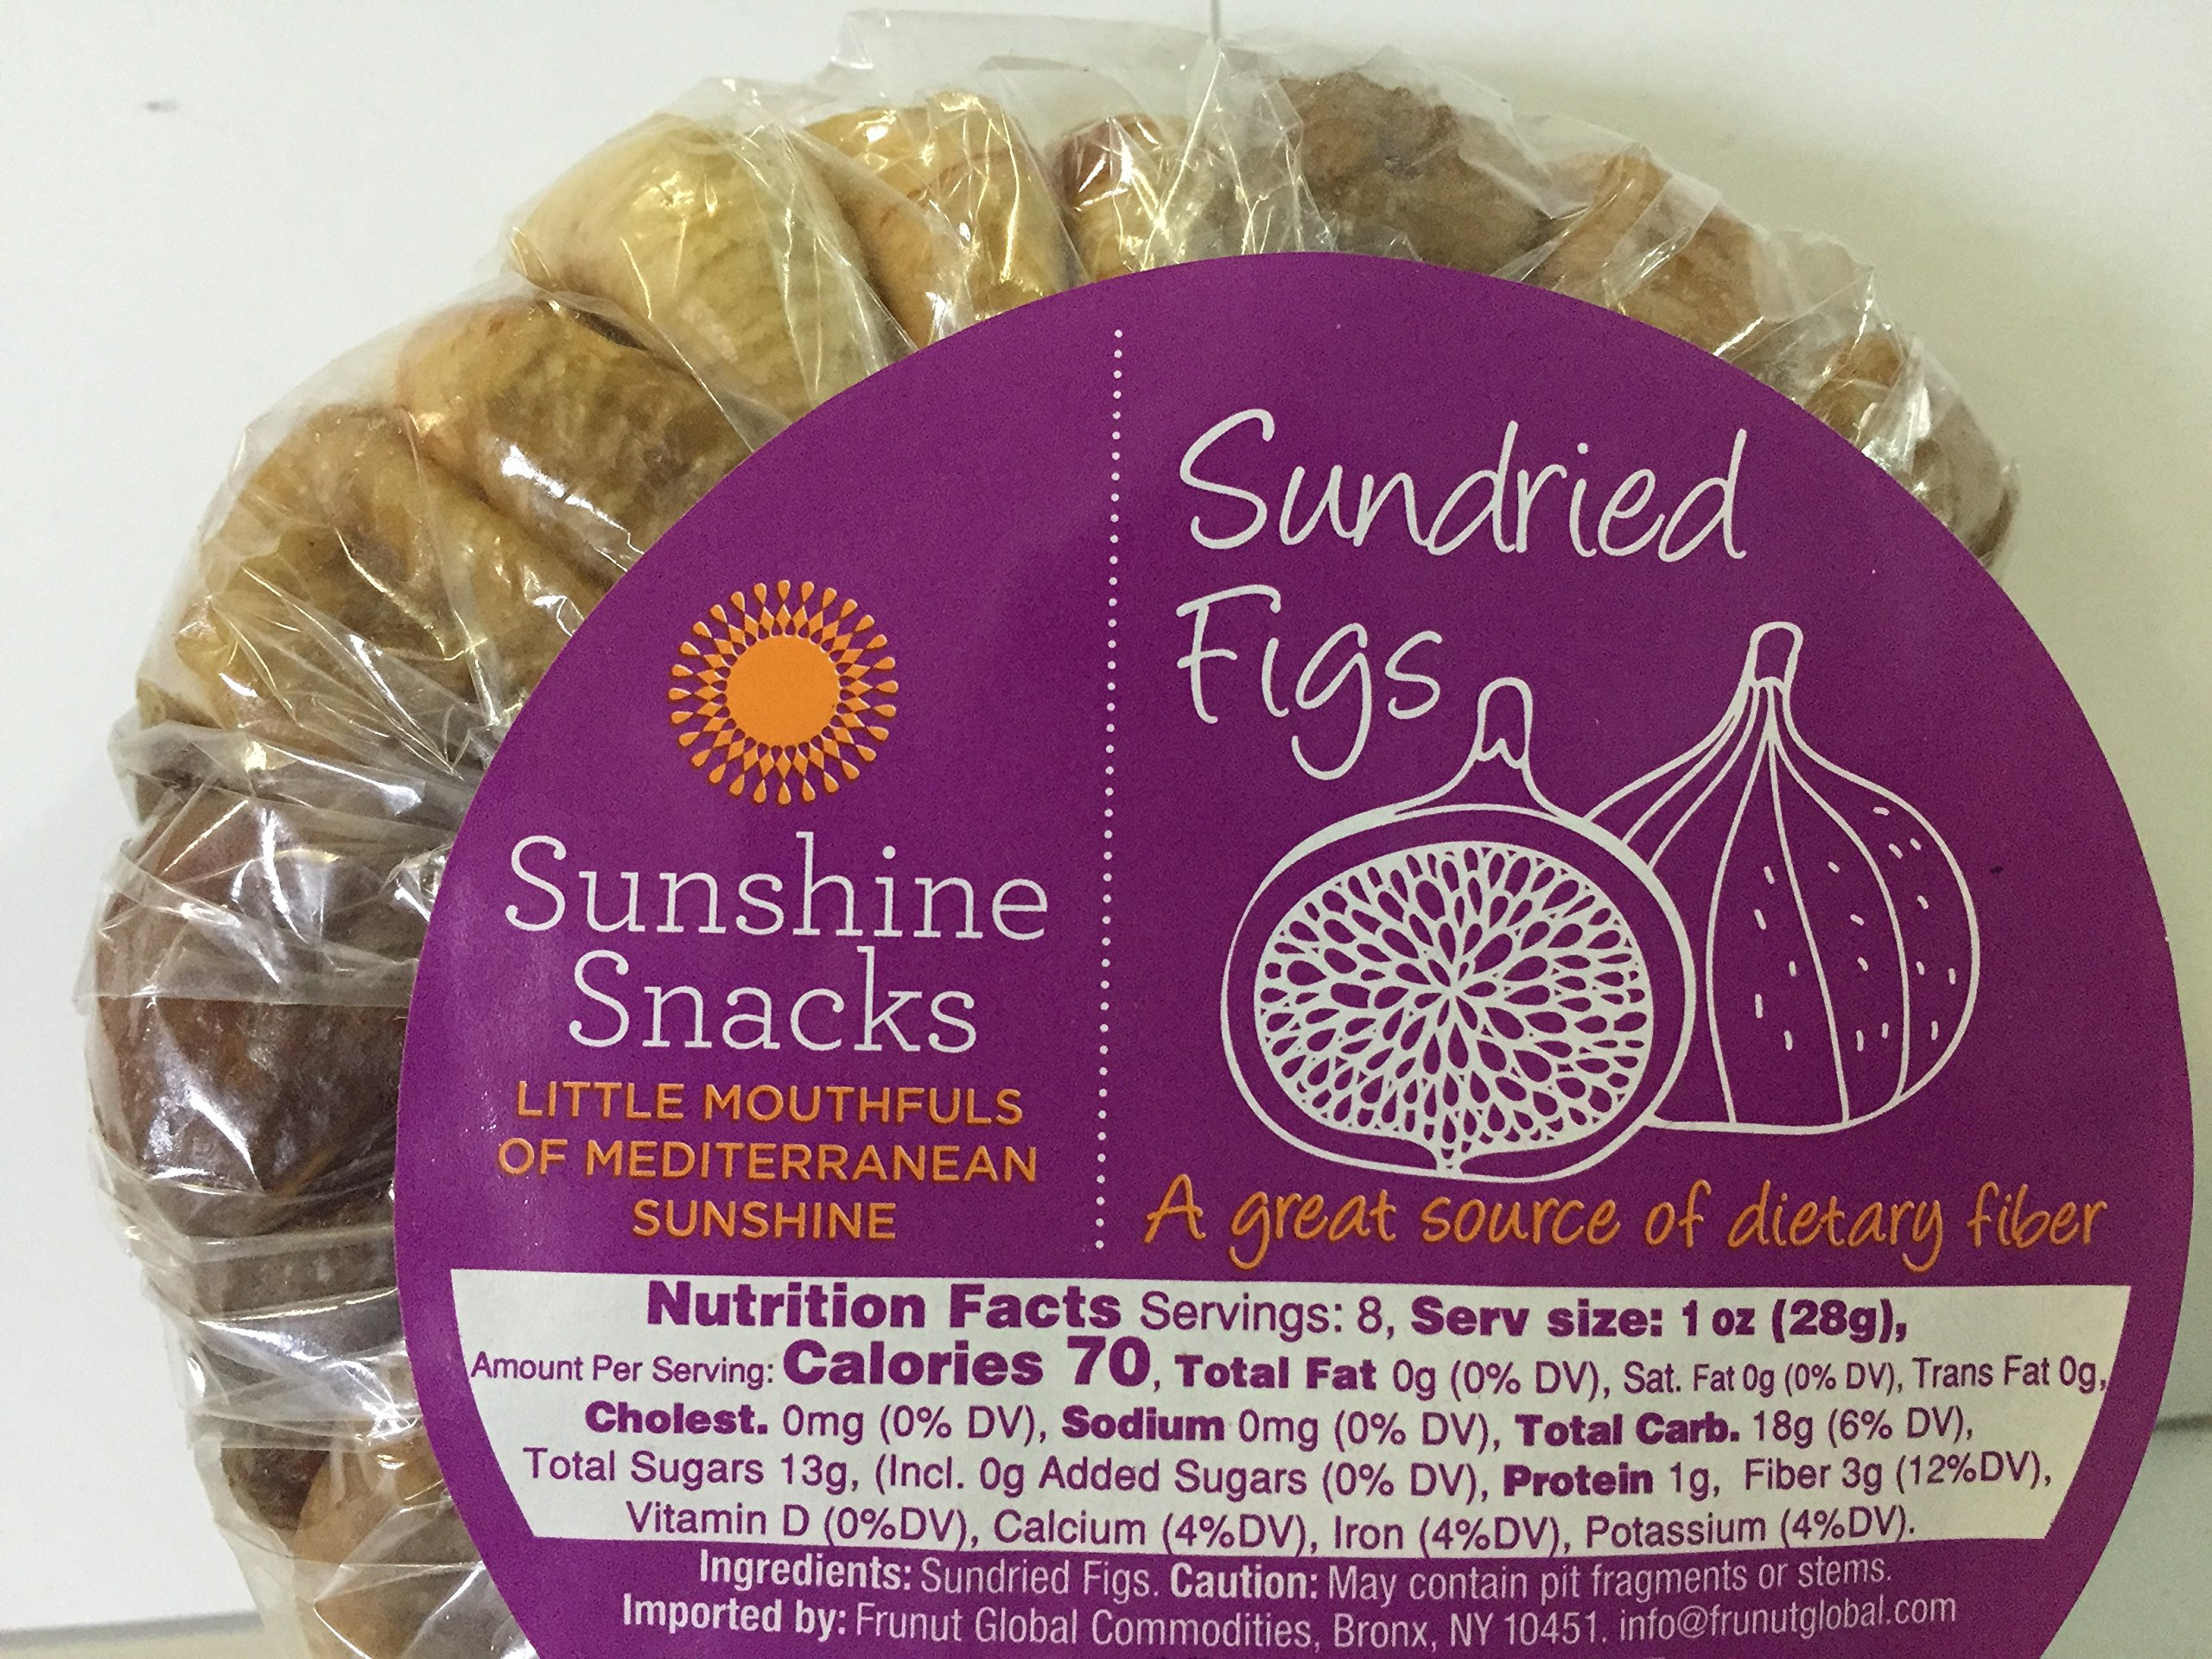 Sunshine Snacks Dried Figs, (Sundried Figs) Net Wt. 15 oz